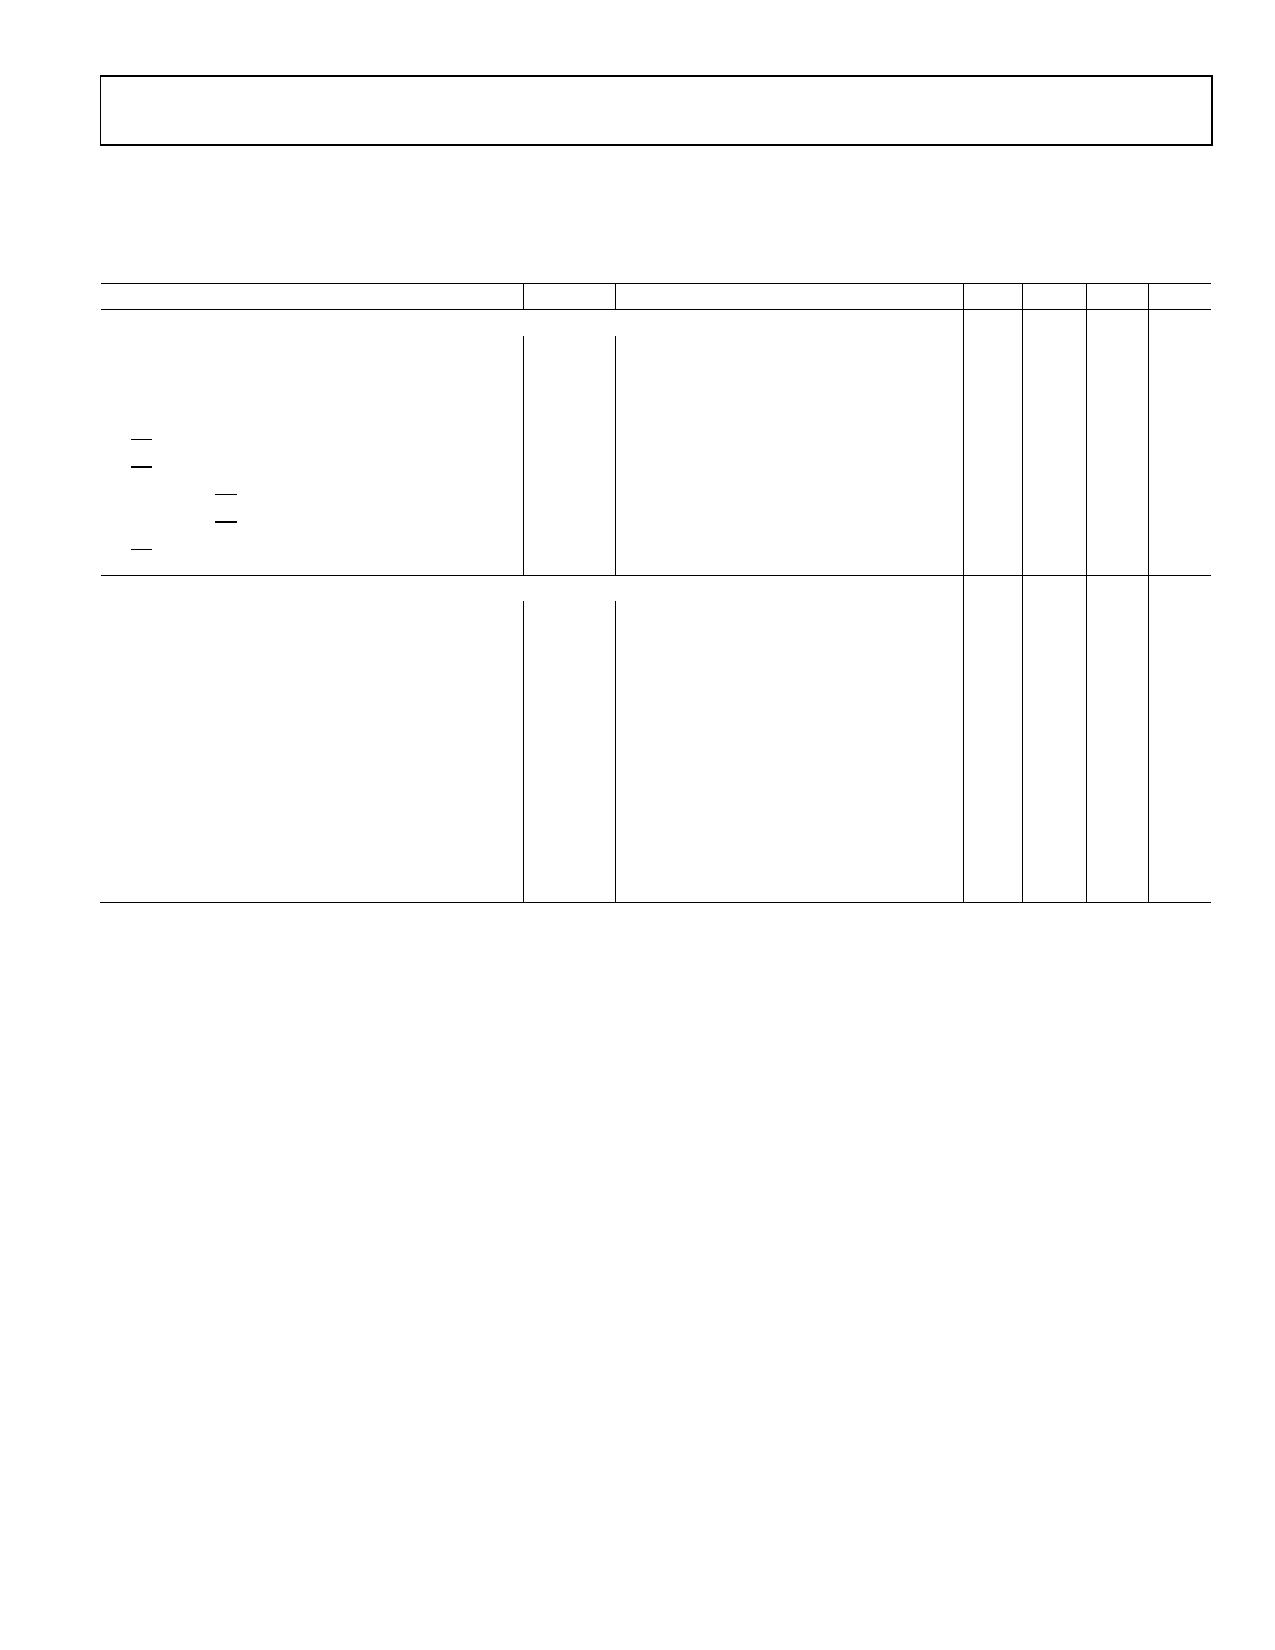 AD5161 pdf, arduino